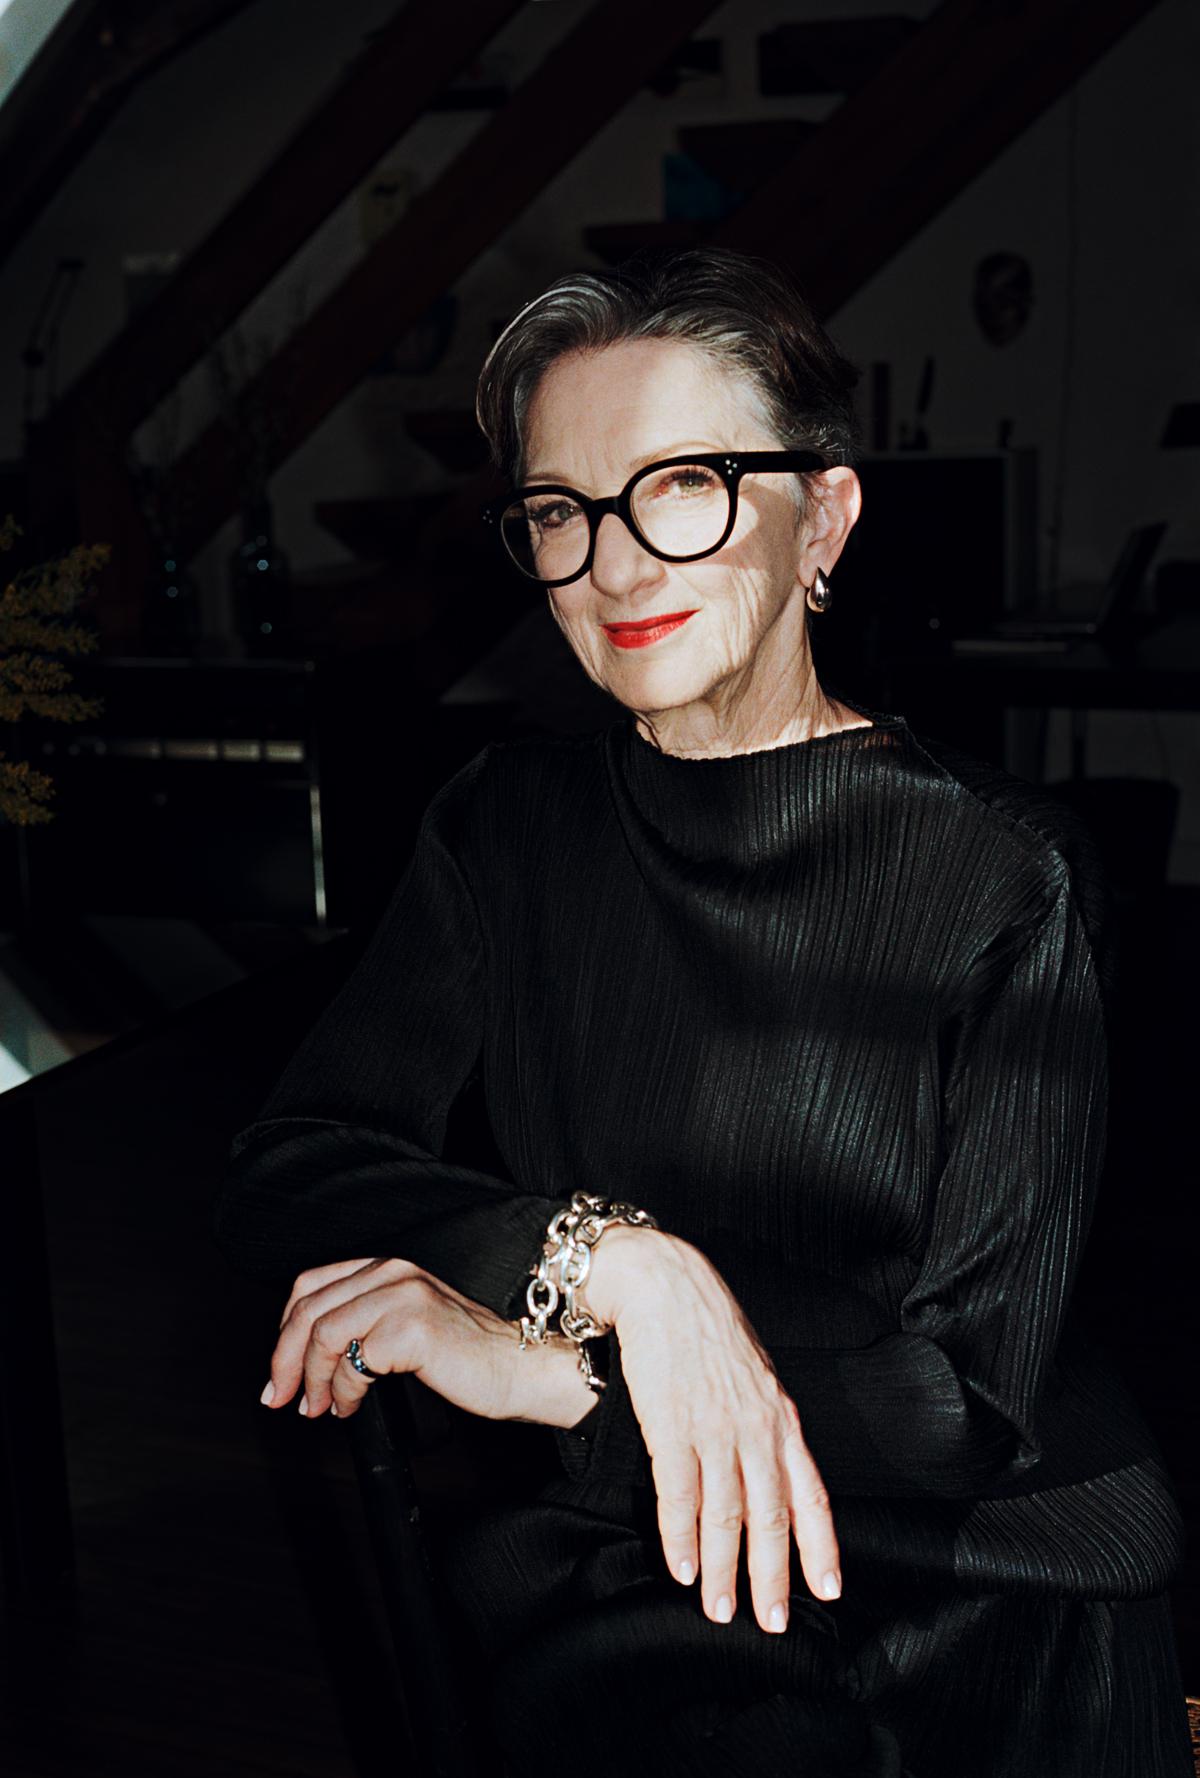 "Simon Habegger Kathleen McNurney Direktorin Portrait ""Tanz Luzerner Theater"" Portrait"